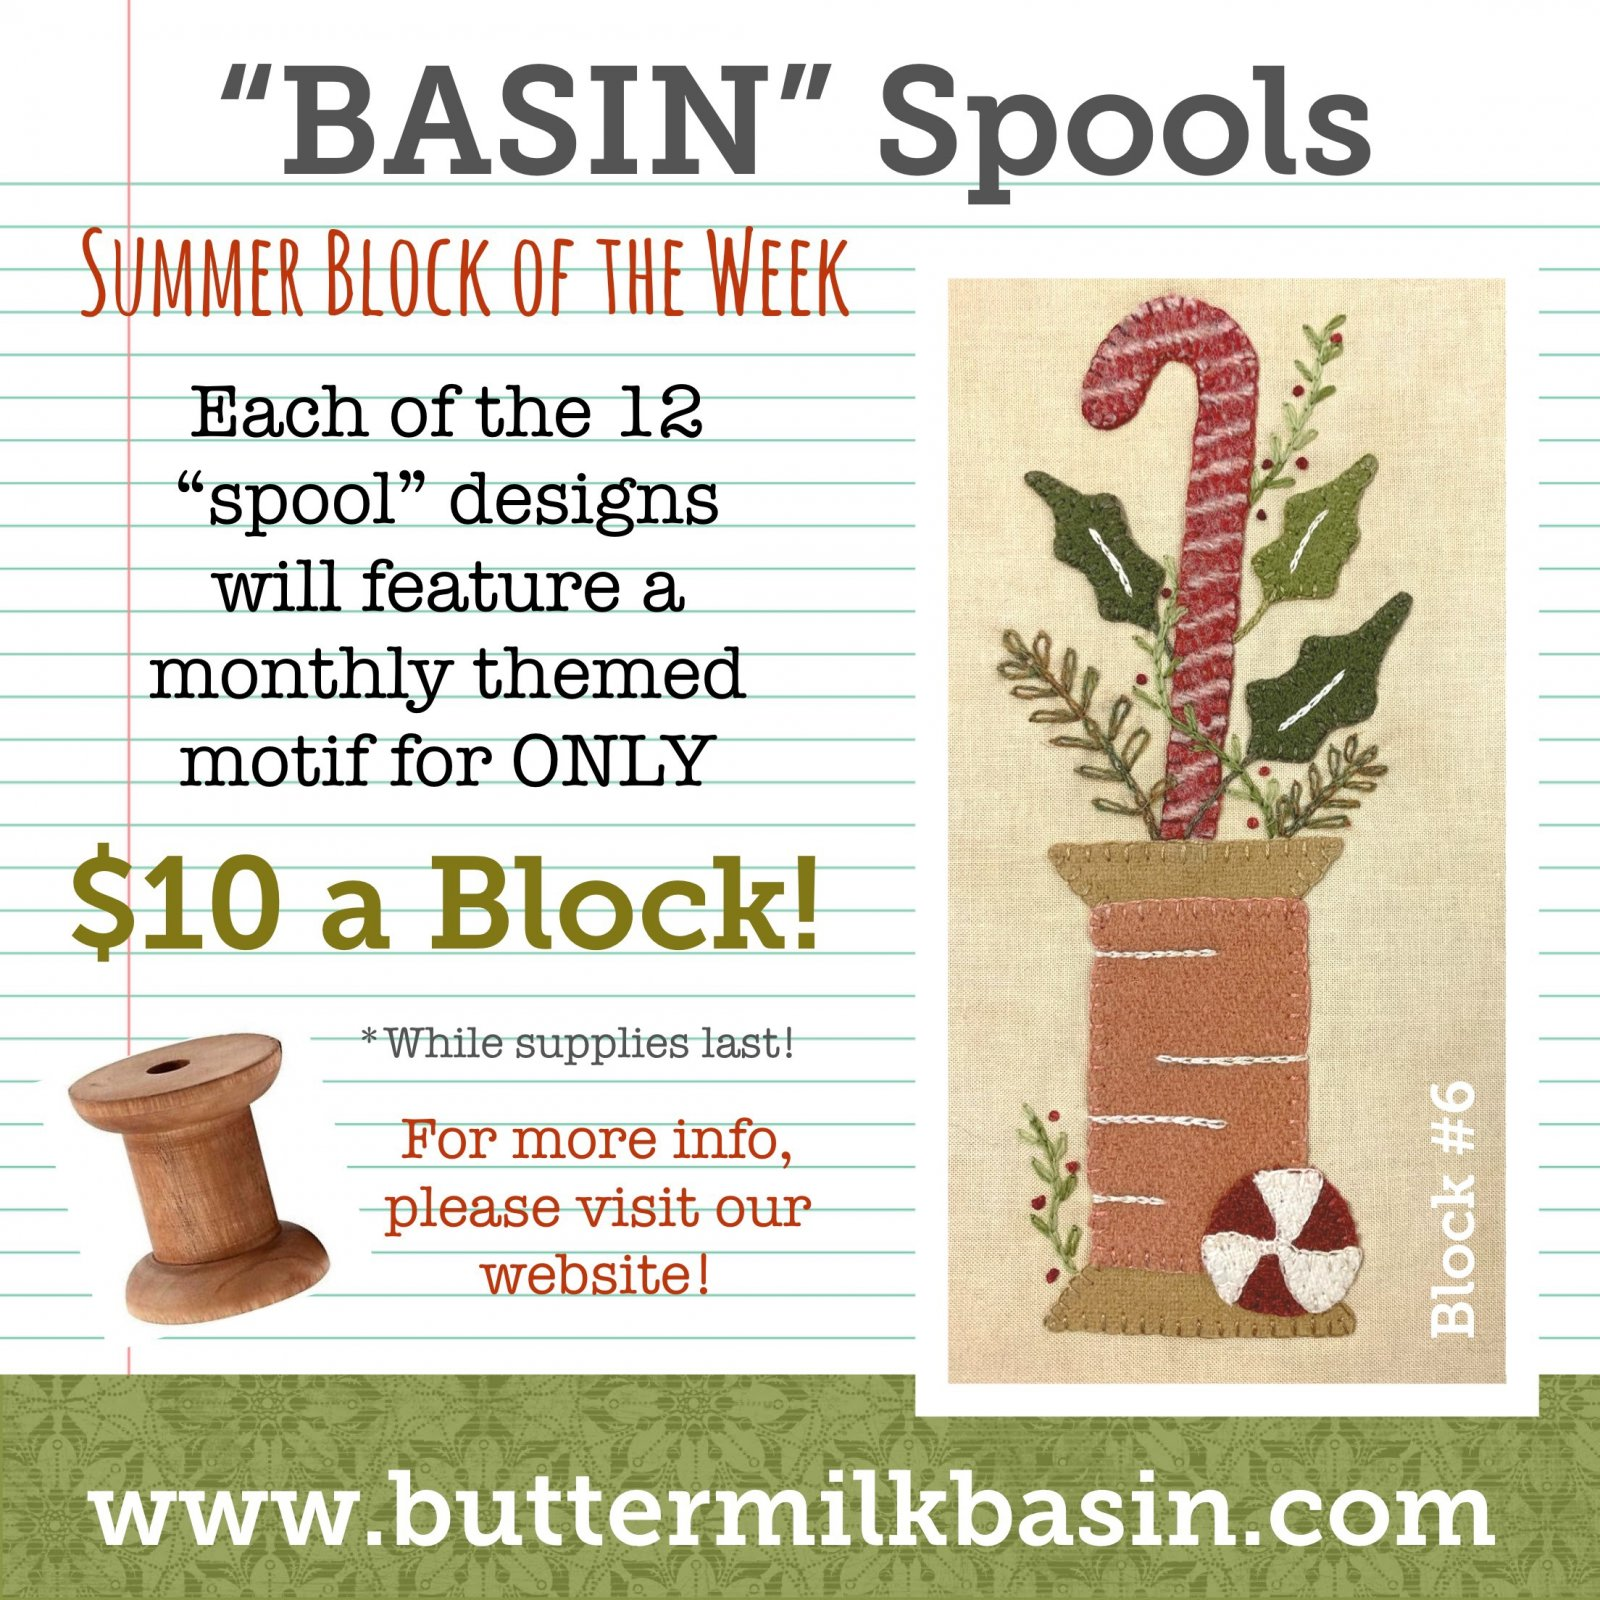 BASIN Spools! Summer Block of the Week! * Blocks 6 Kit & Pattern